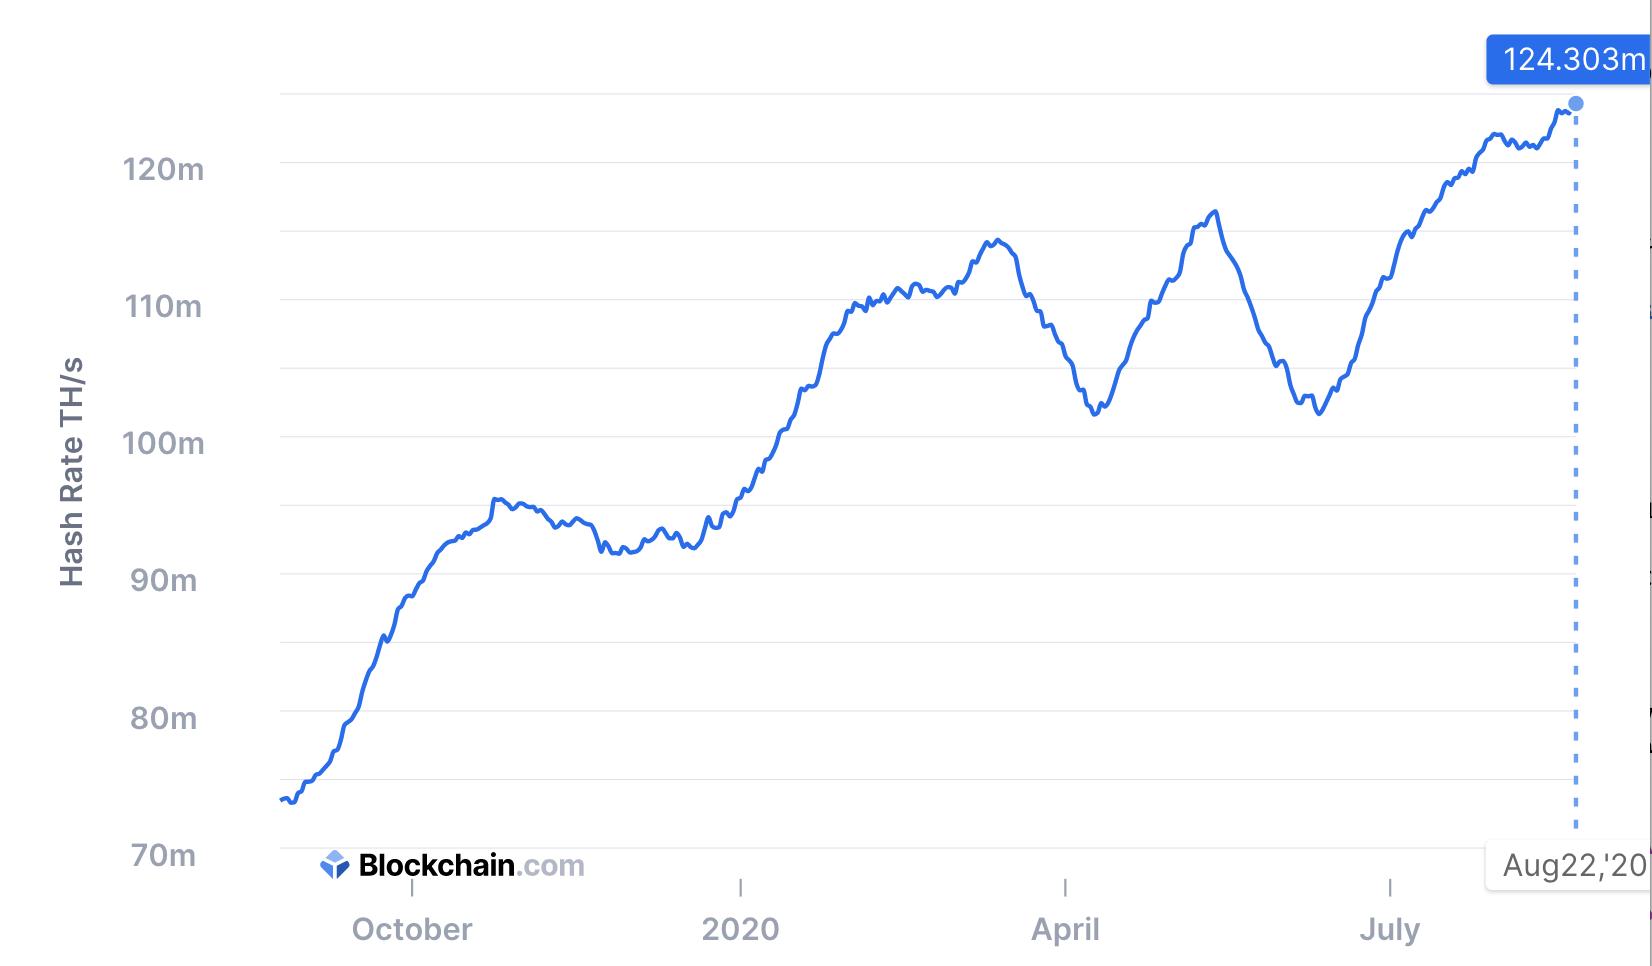 Bitcoin hash hits new high, Aug 2020